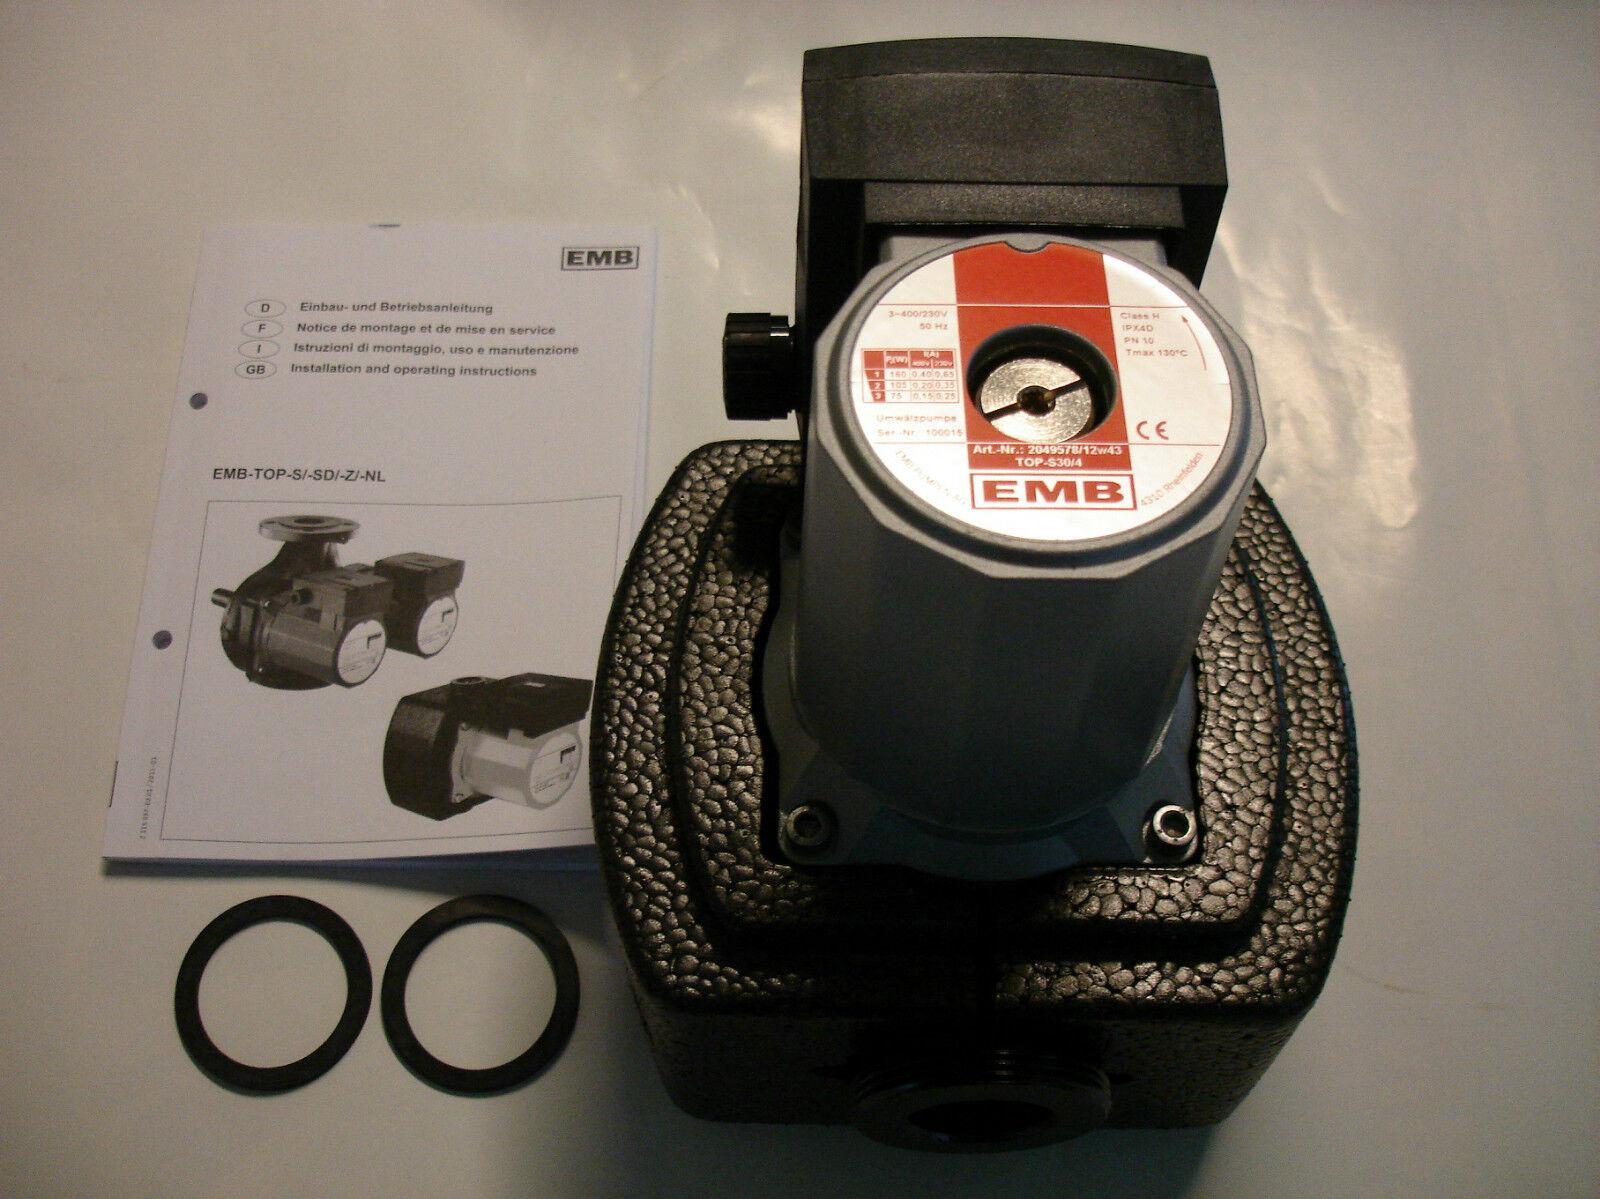 EMB / WILO TOP-S 30/4 DM PN 6/10 2049578 / 2044012 Nassläufer - Standard - Pumpe